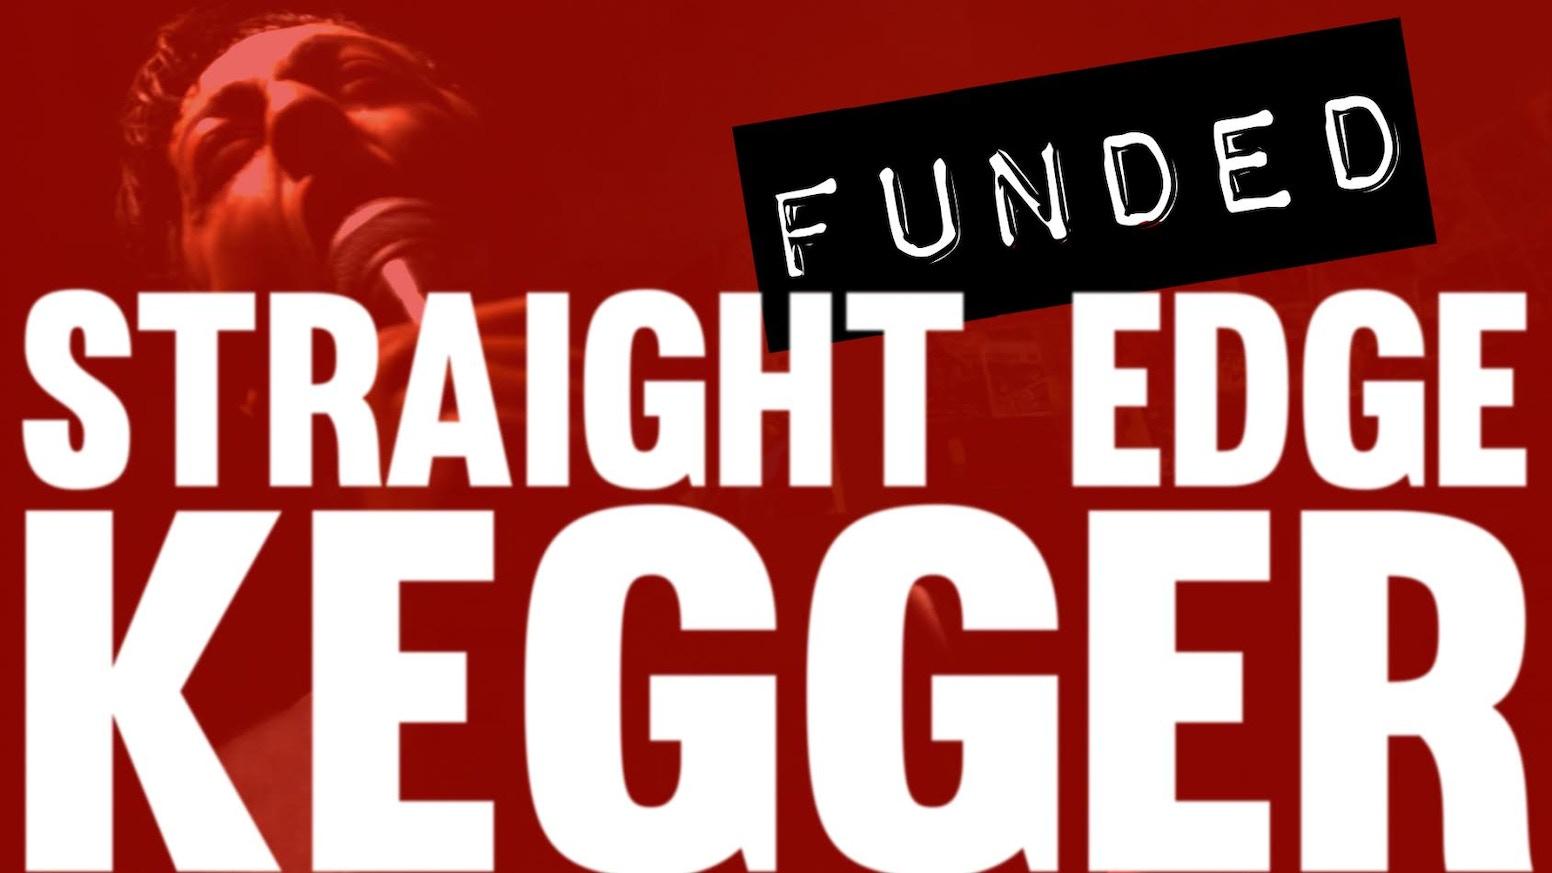 STRAIGHT EDGE KEGGER The Movie